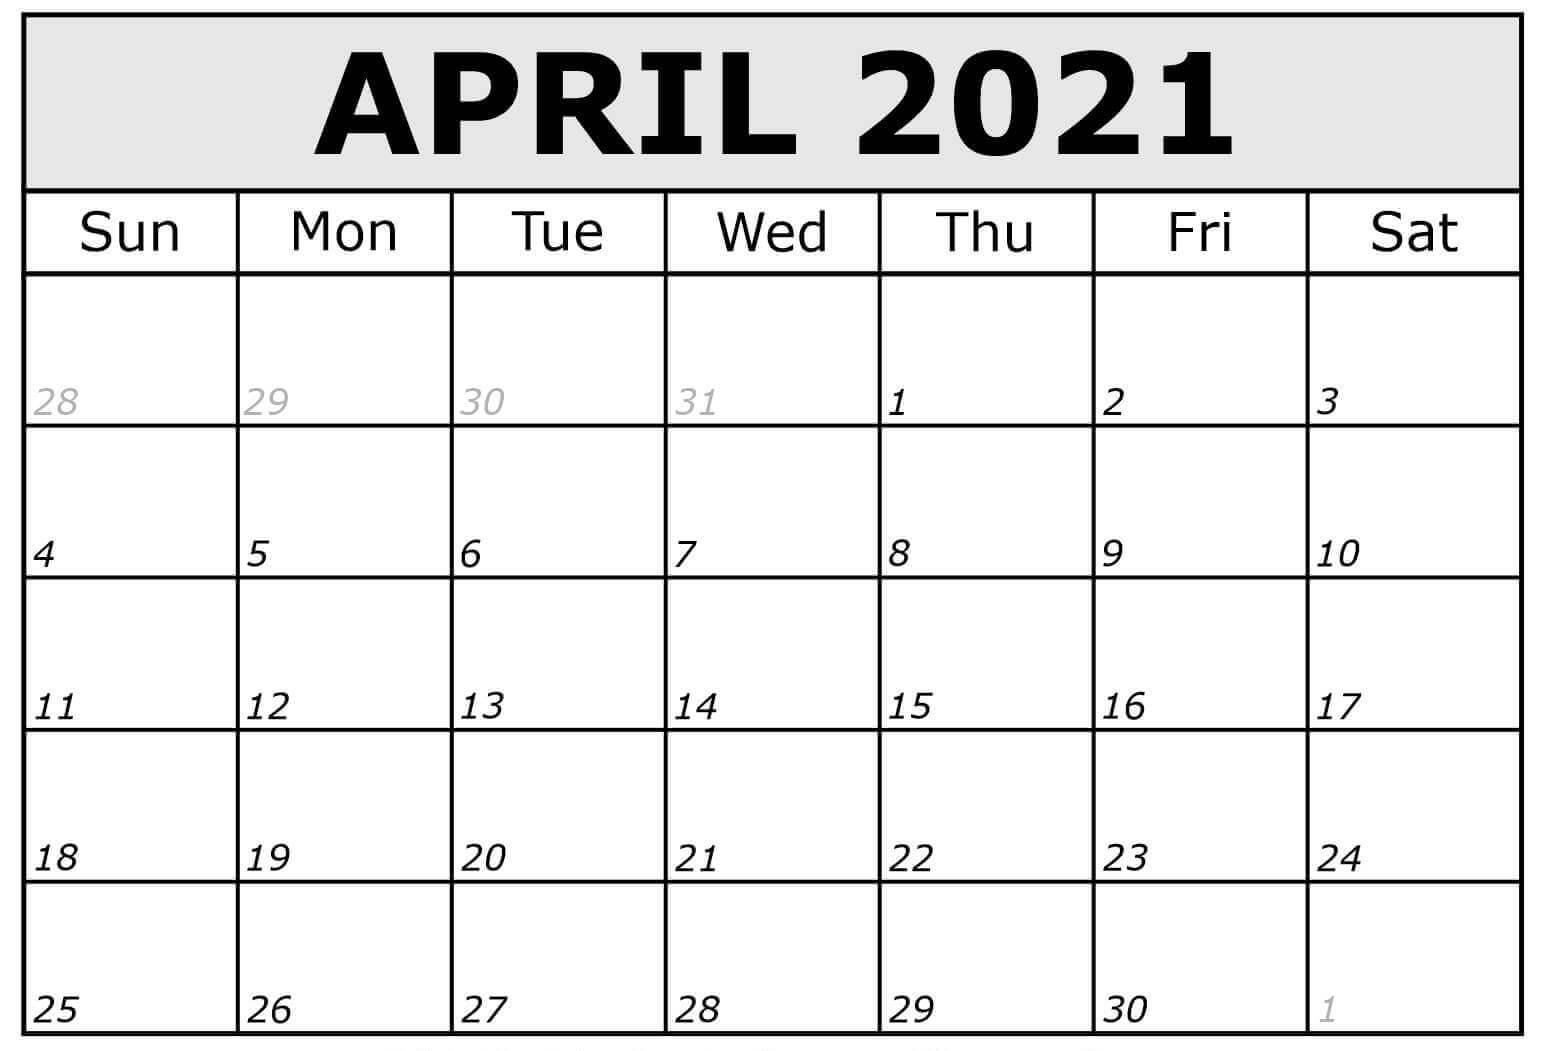 Fillable April 2021 Calendar Template